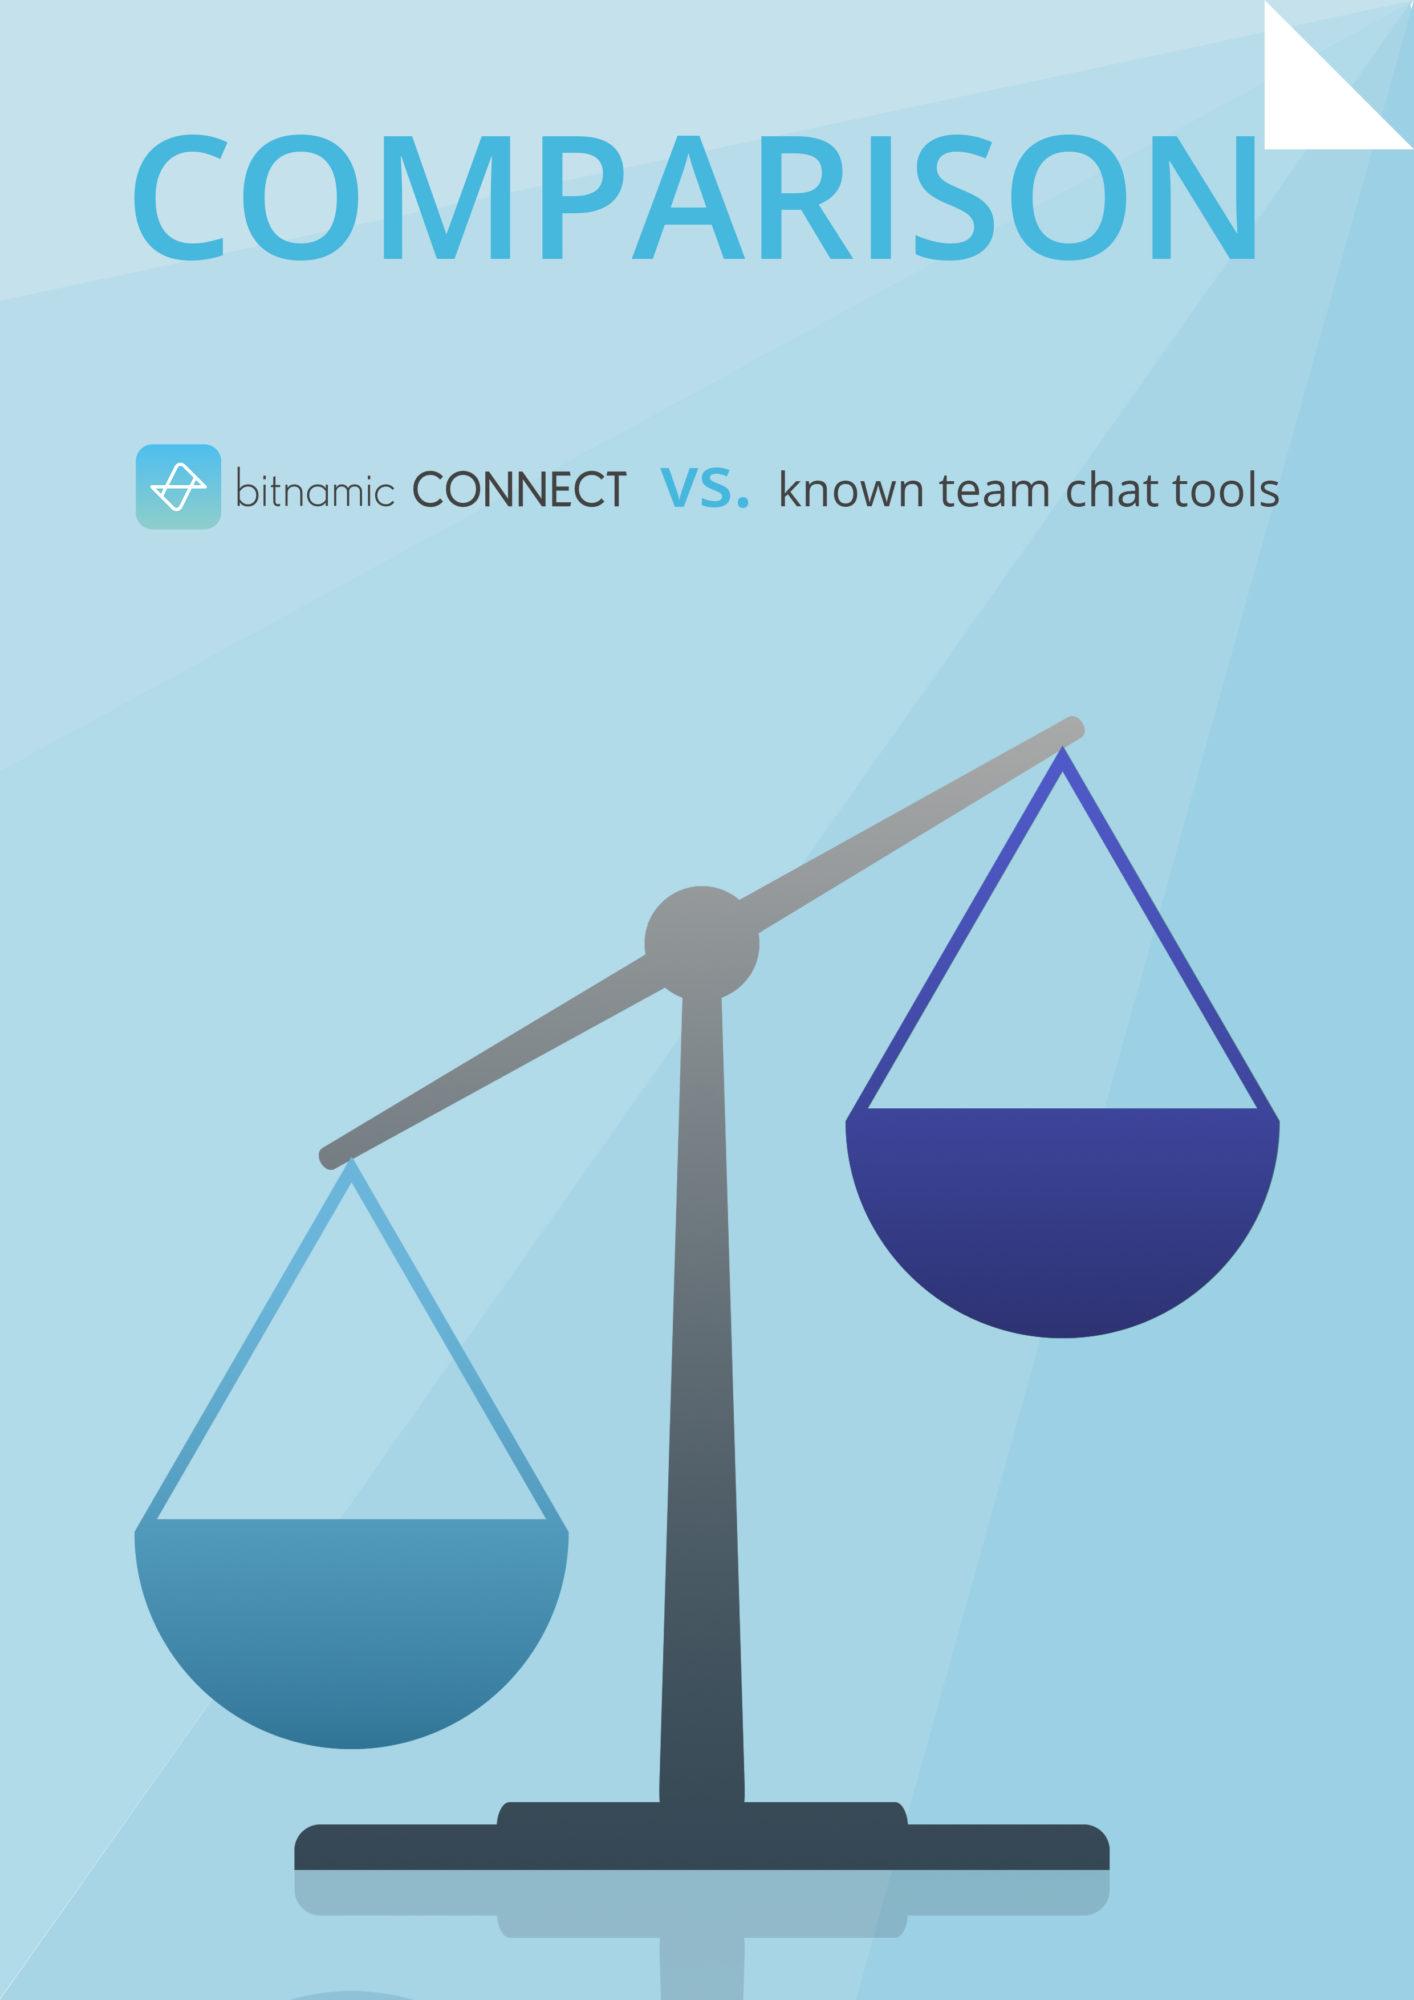 Comparison bitnamic CONNECT vs team chat tools